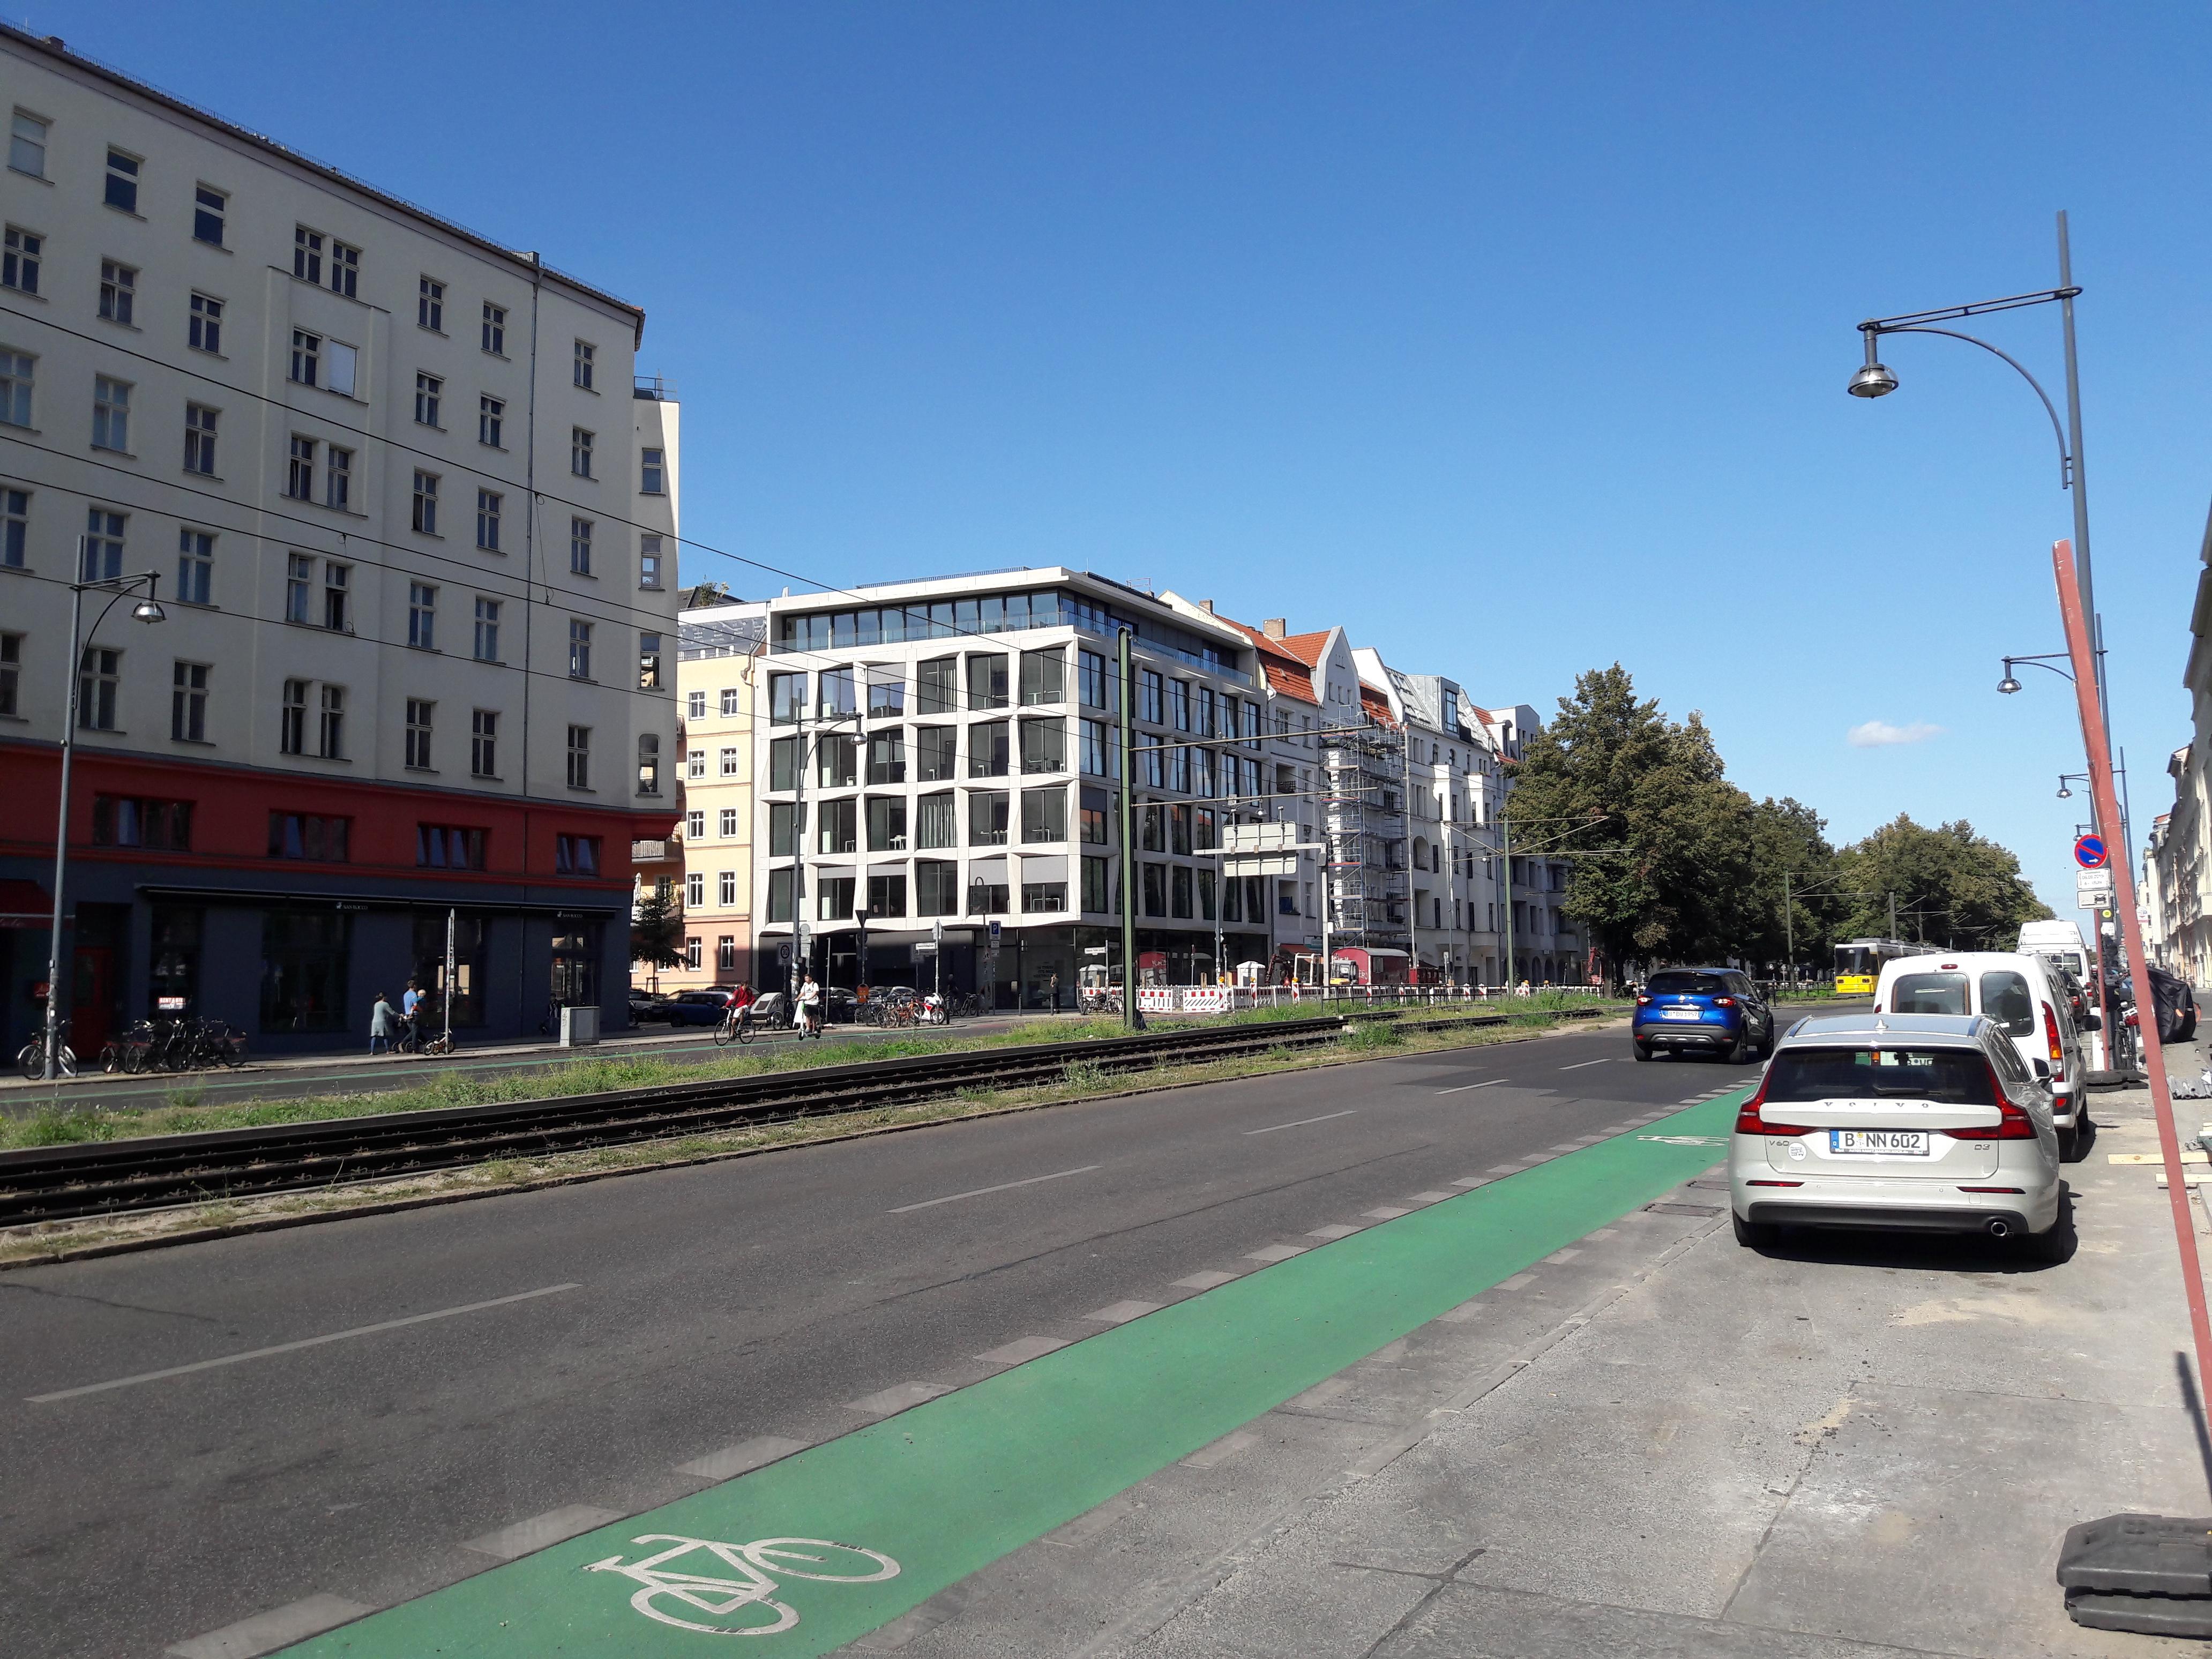 Neubauprojekt-Heinrich-Roller-Strasse.jpg